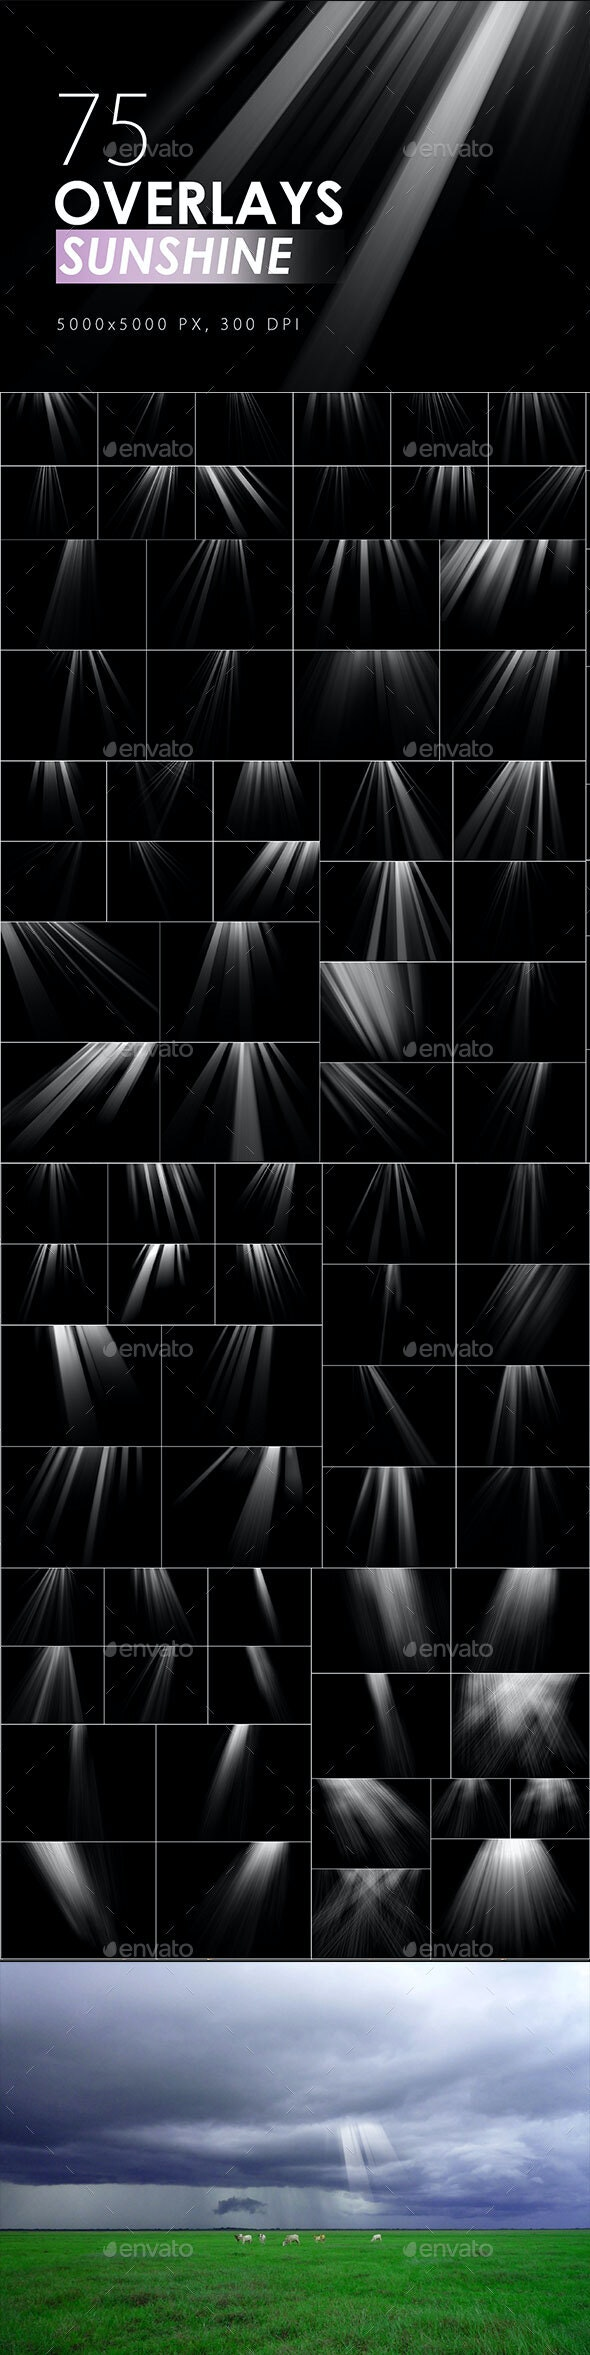 75 Sunshine Overlays - Miscellaneous Backgrounds